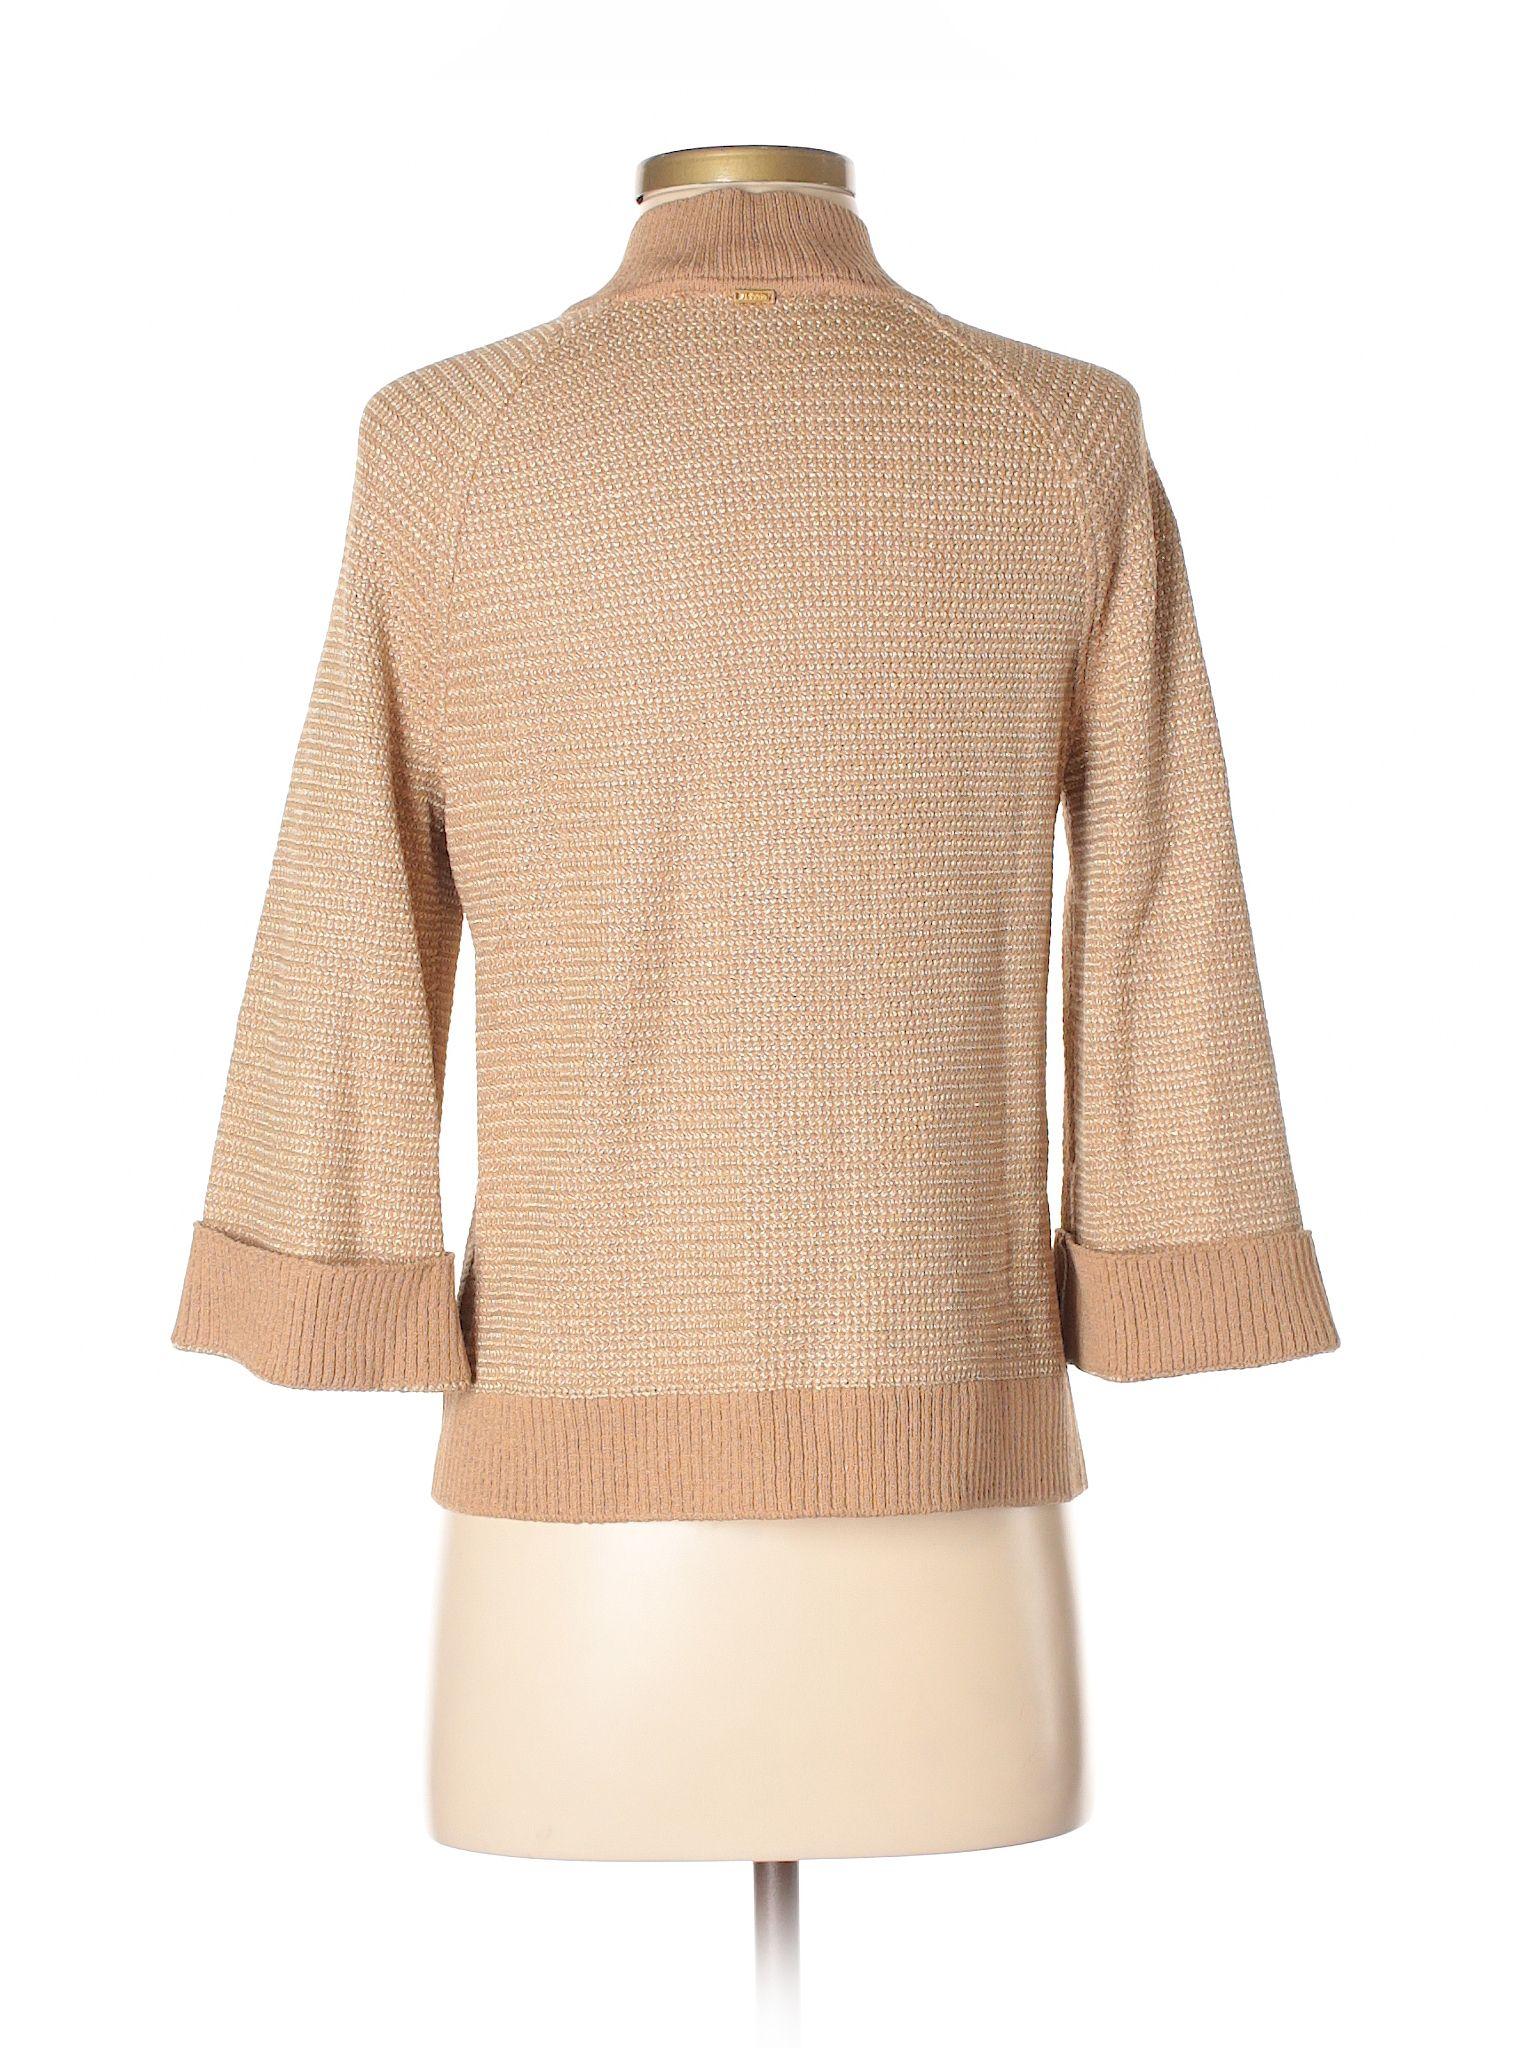 St John Jacket Size Tan Womenus Jackets u Outerwear